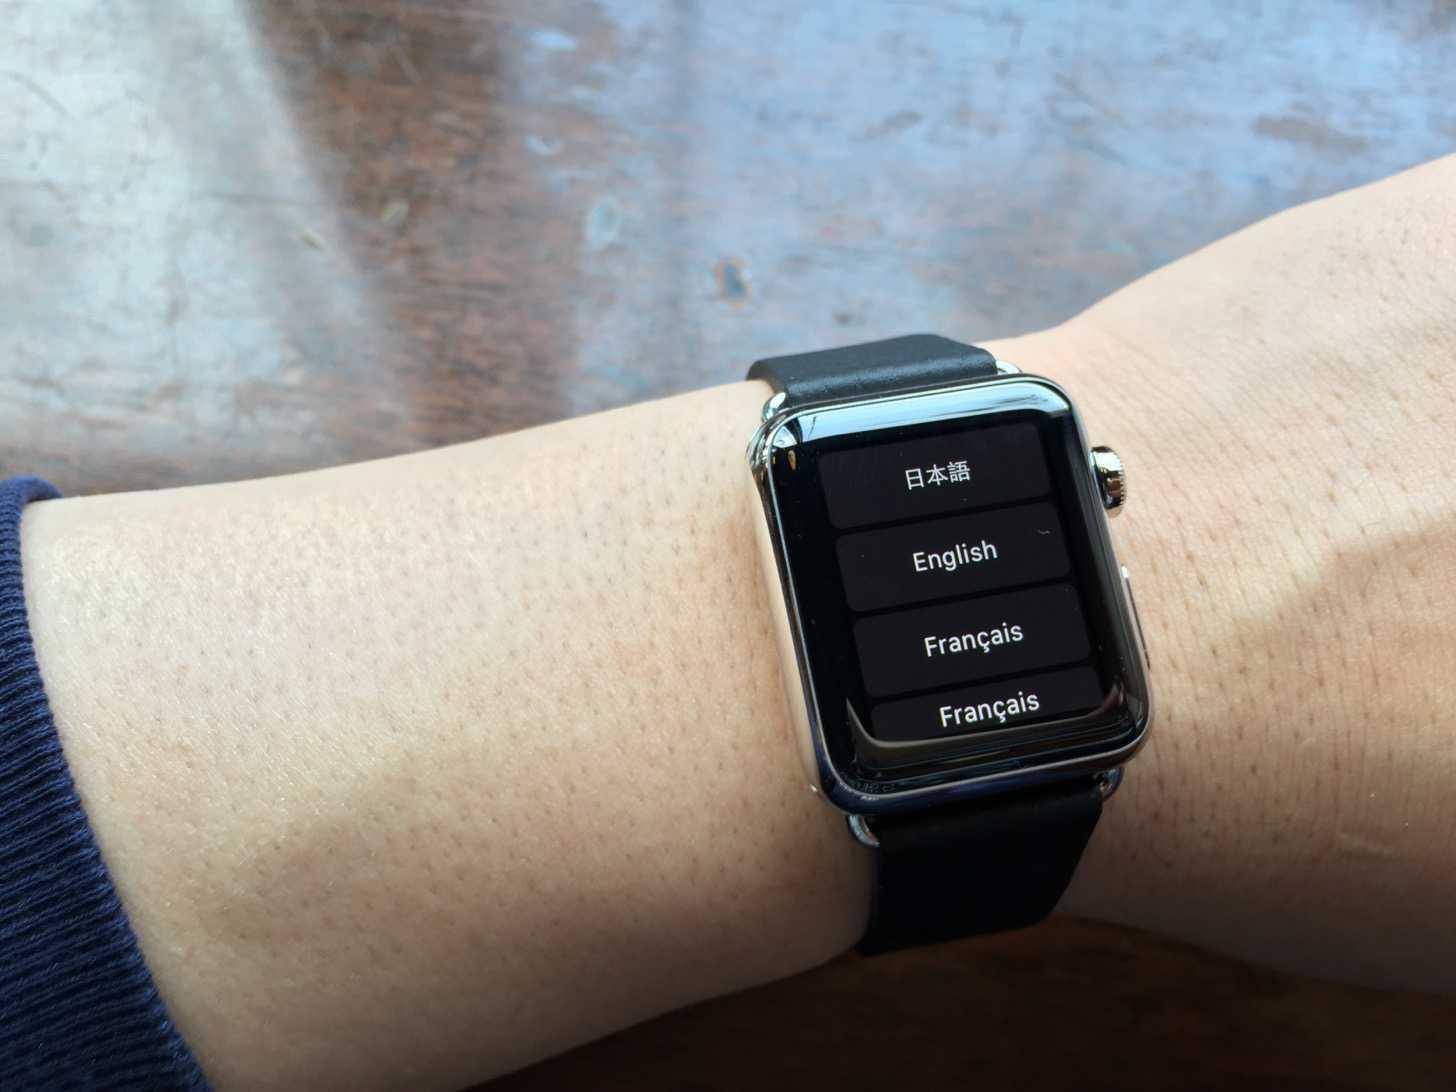 Apple Watchの言語設定